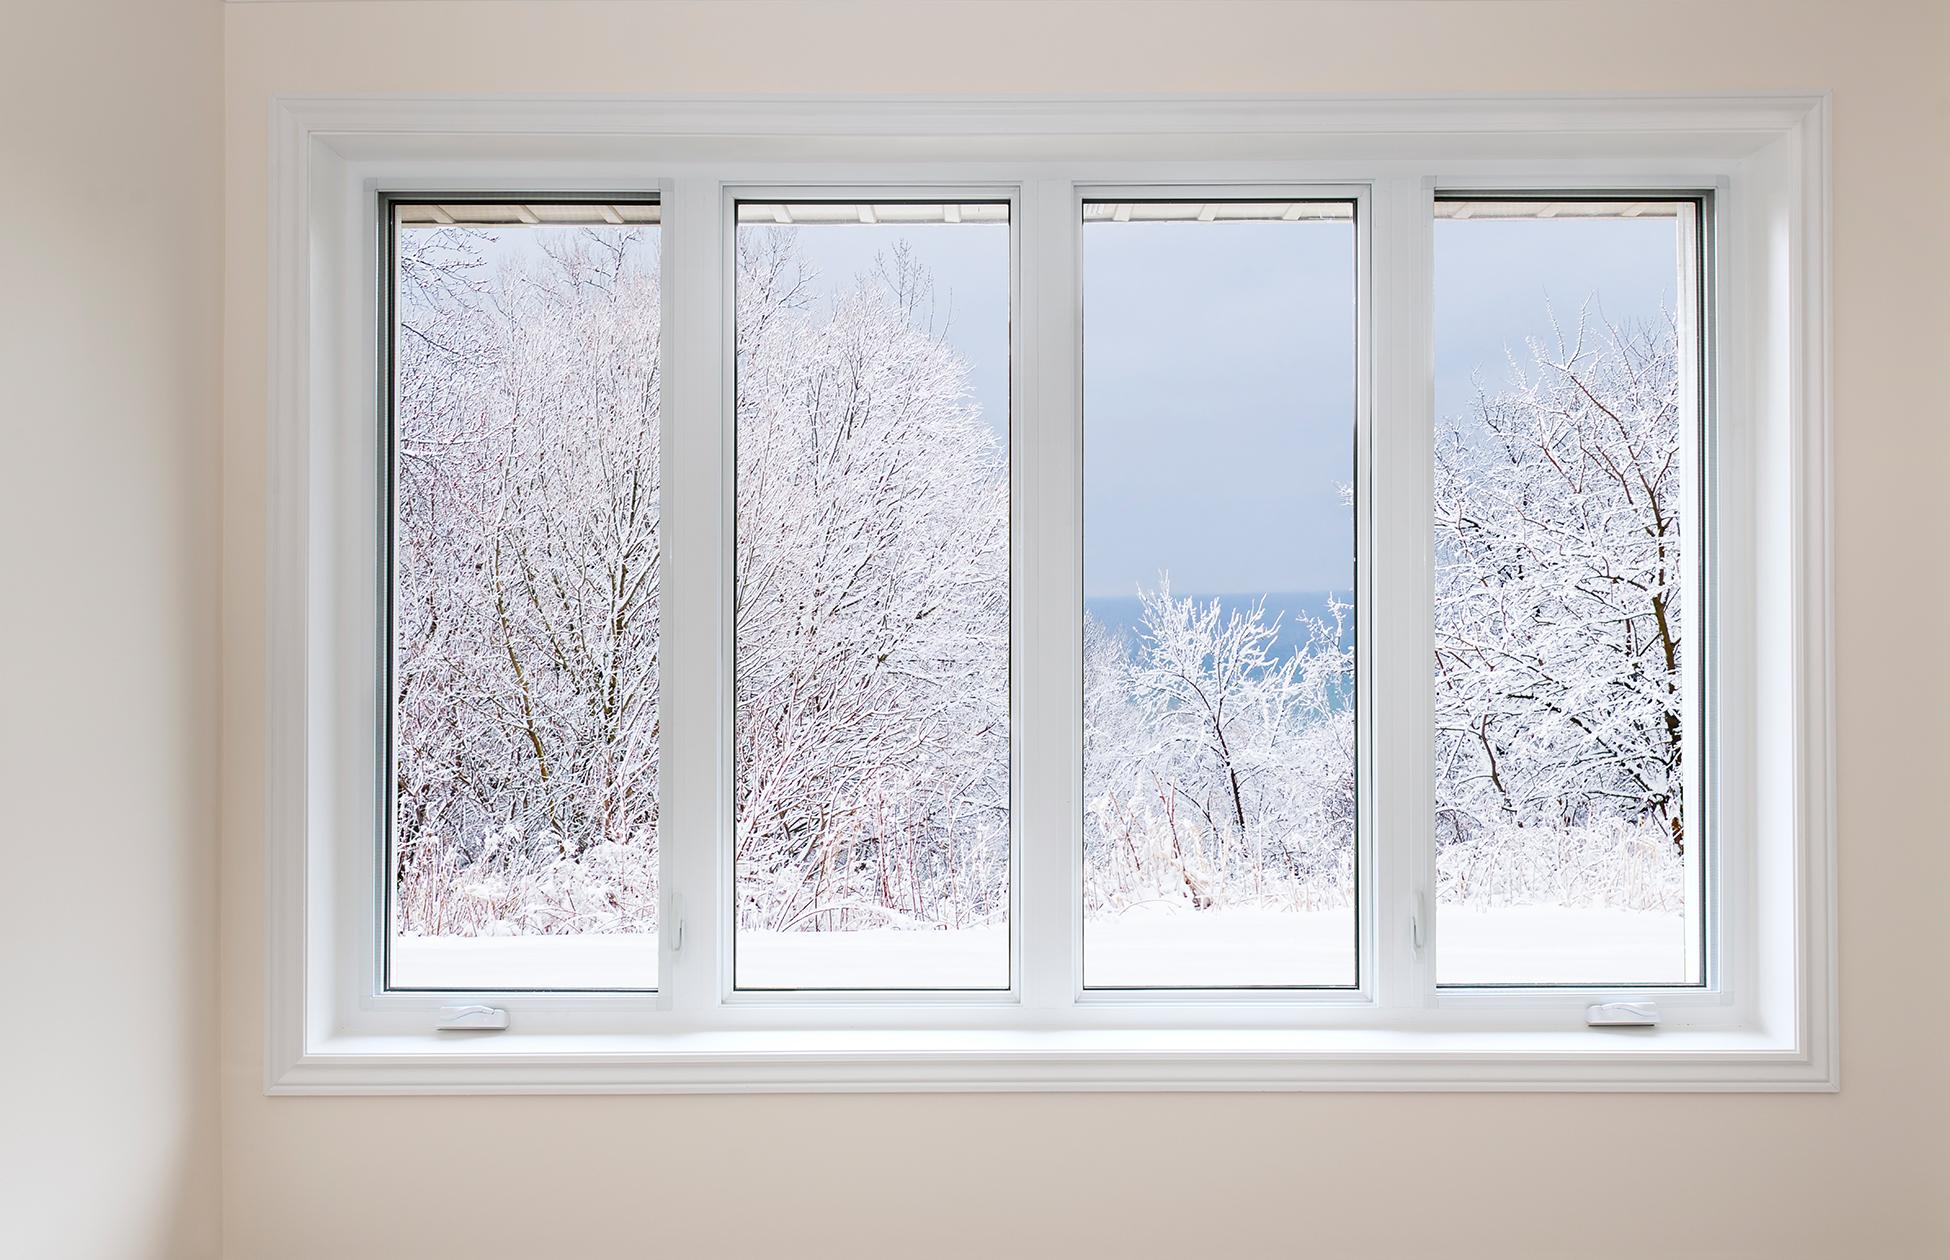 Installation de fenêtres en hiver